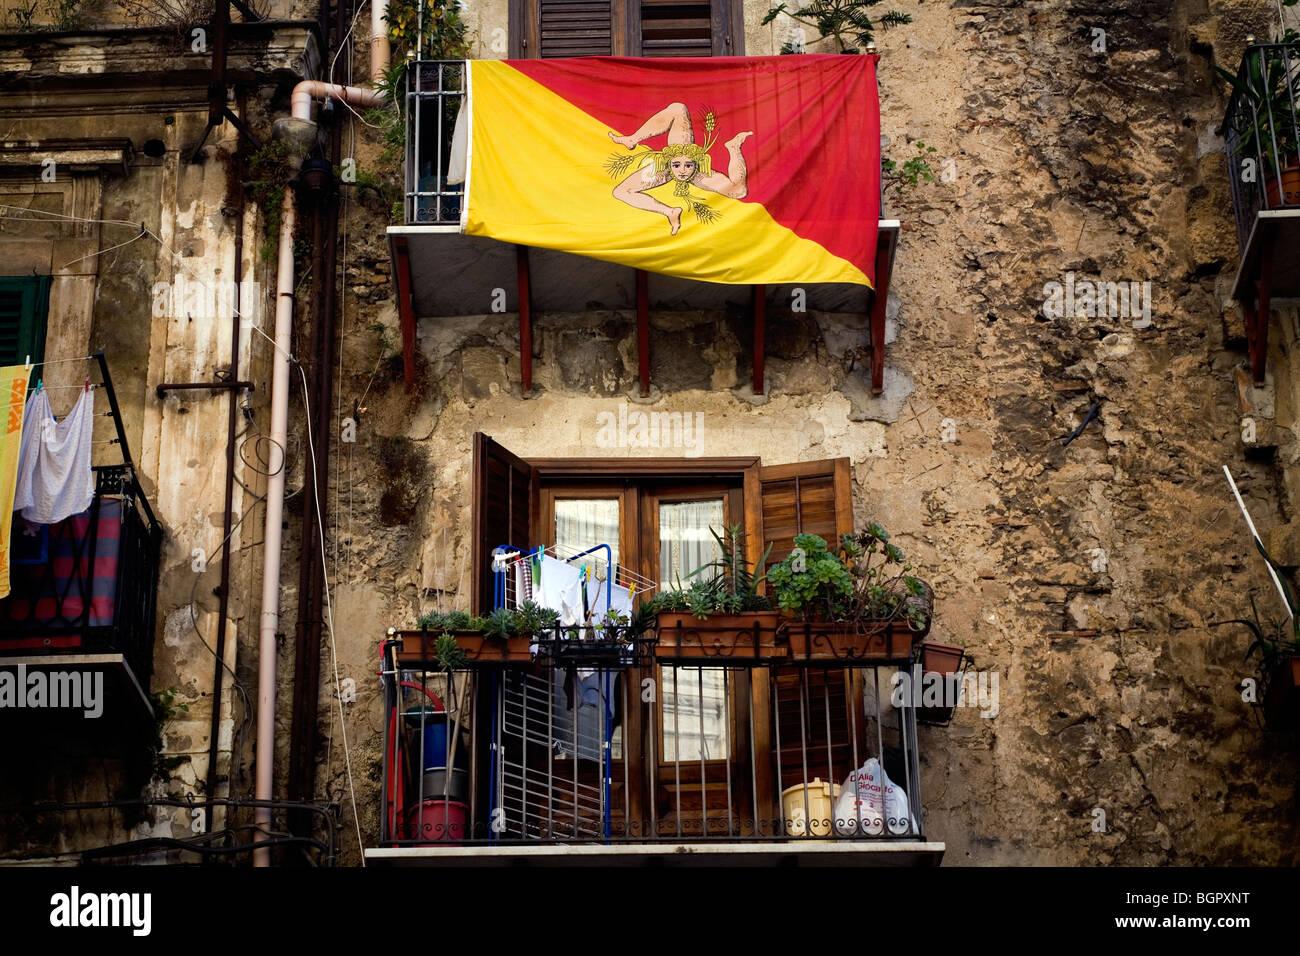 Sizilianische Flagge auf einem Balkon, Palermo, Sizilien, Italien. Stockbild